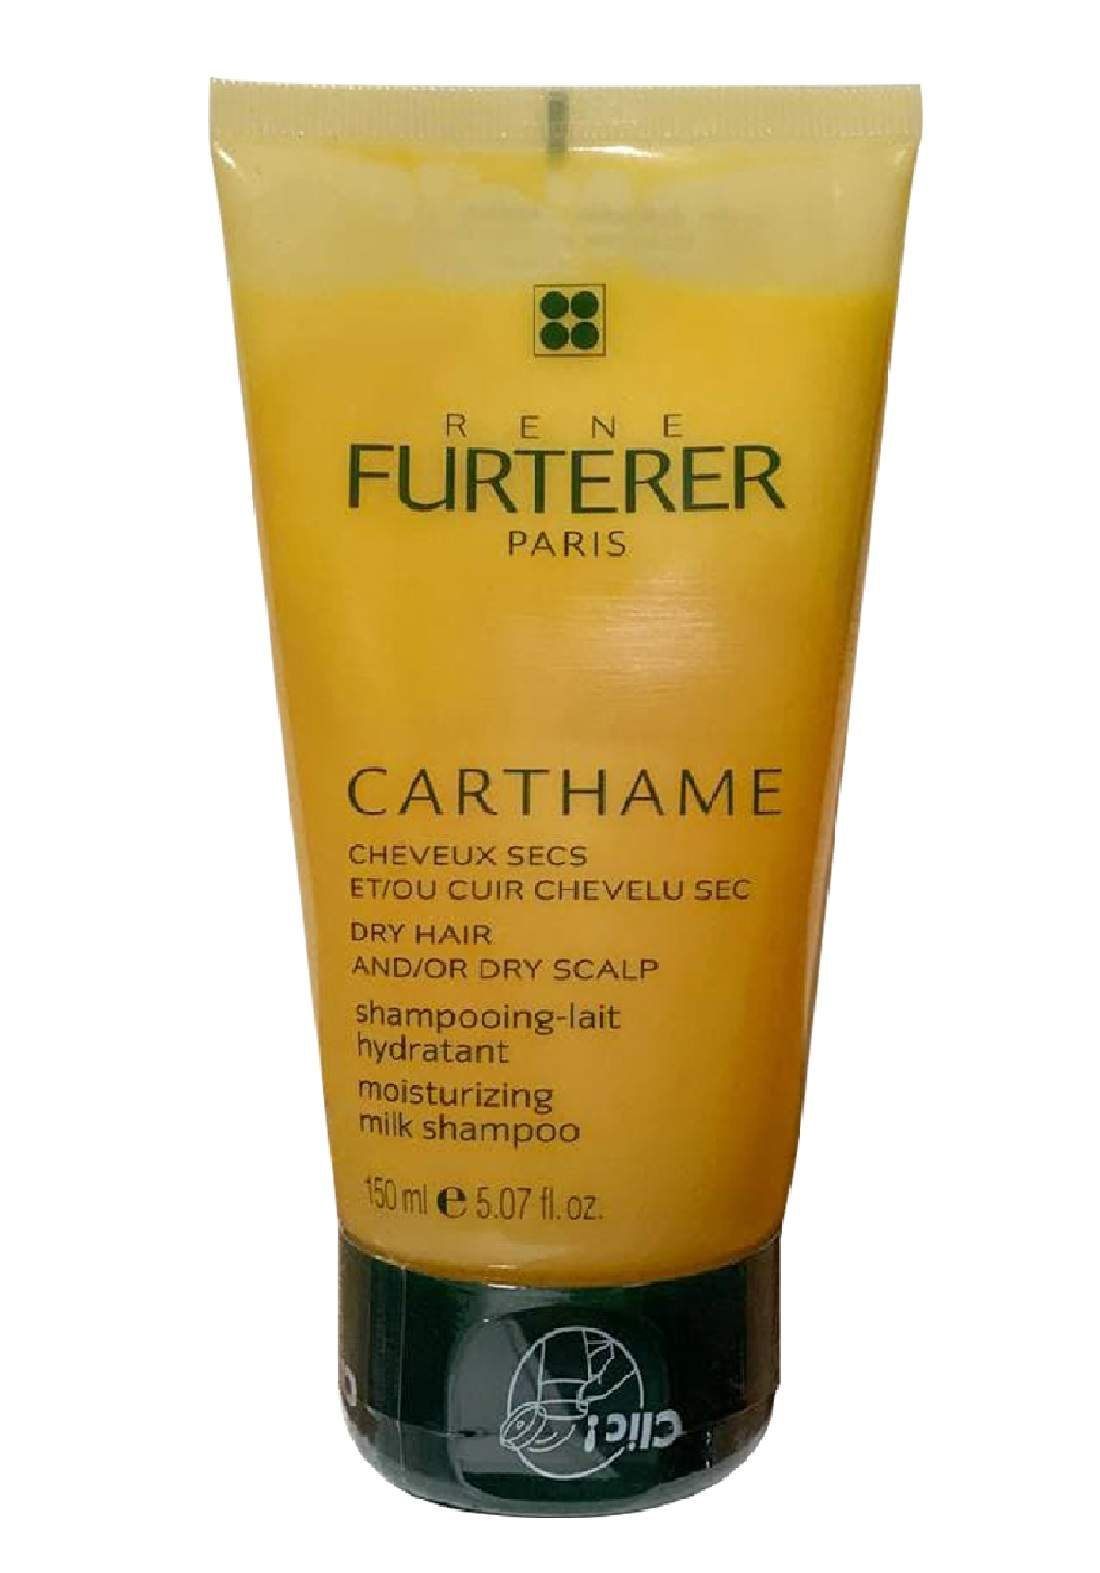 RENE FURTERER CARTHAME 150MLشامبو مرطب للشعر الجاف  والفروة الراس الجافة